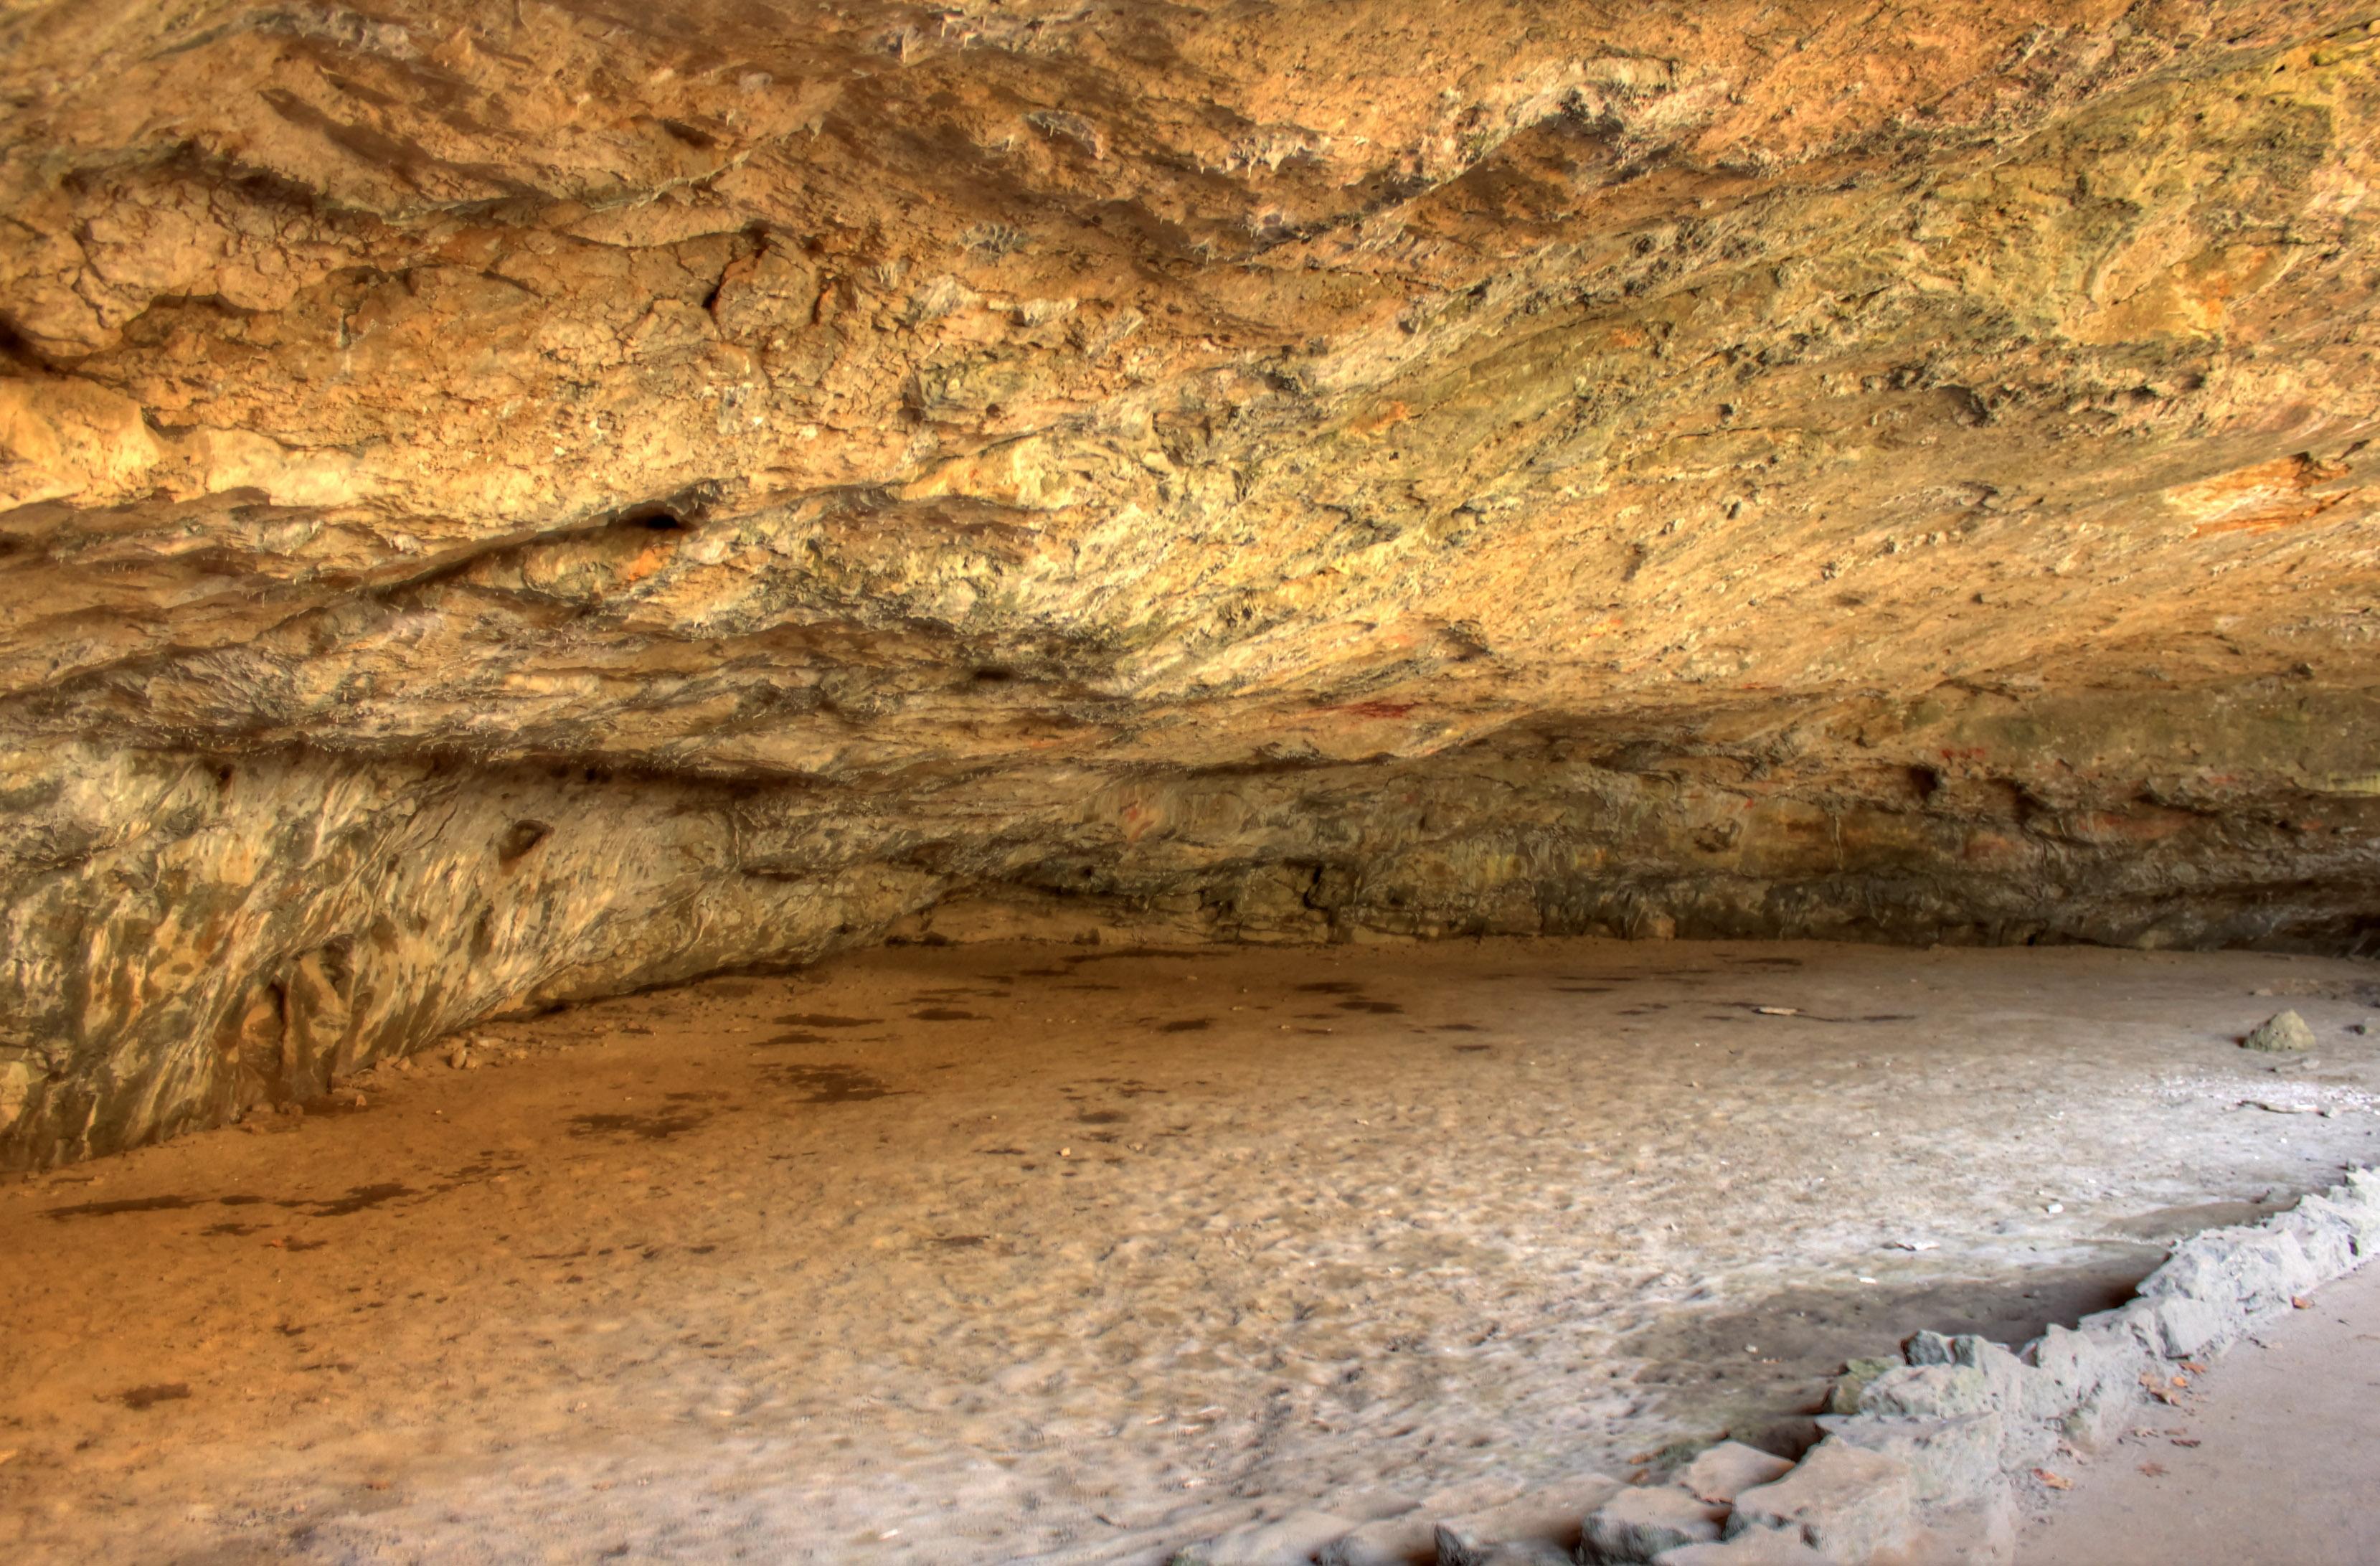 Small Cavern Room at Maquoketa State Park, Iowa image - Free stock ...